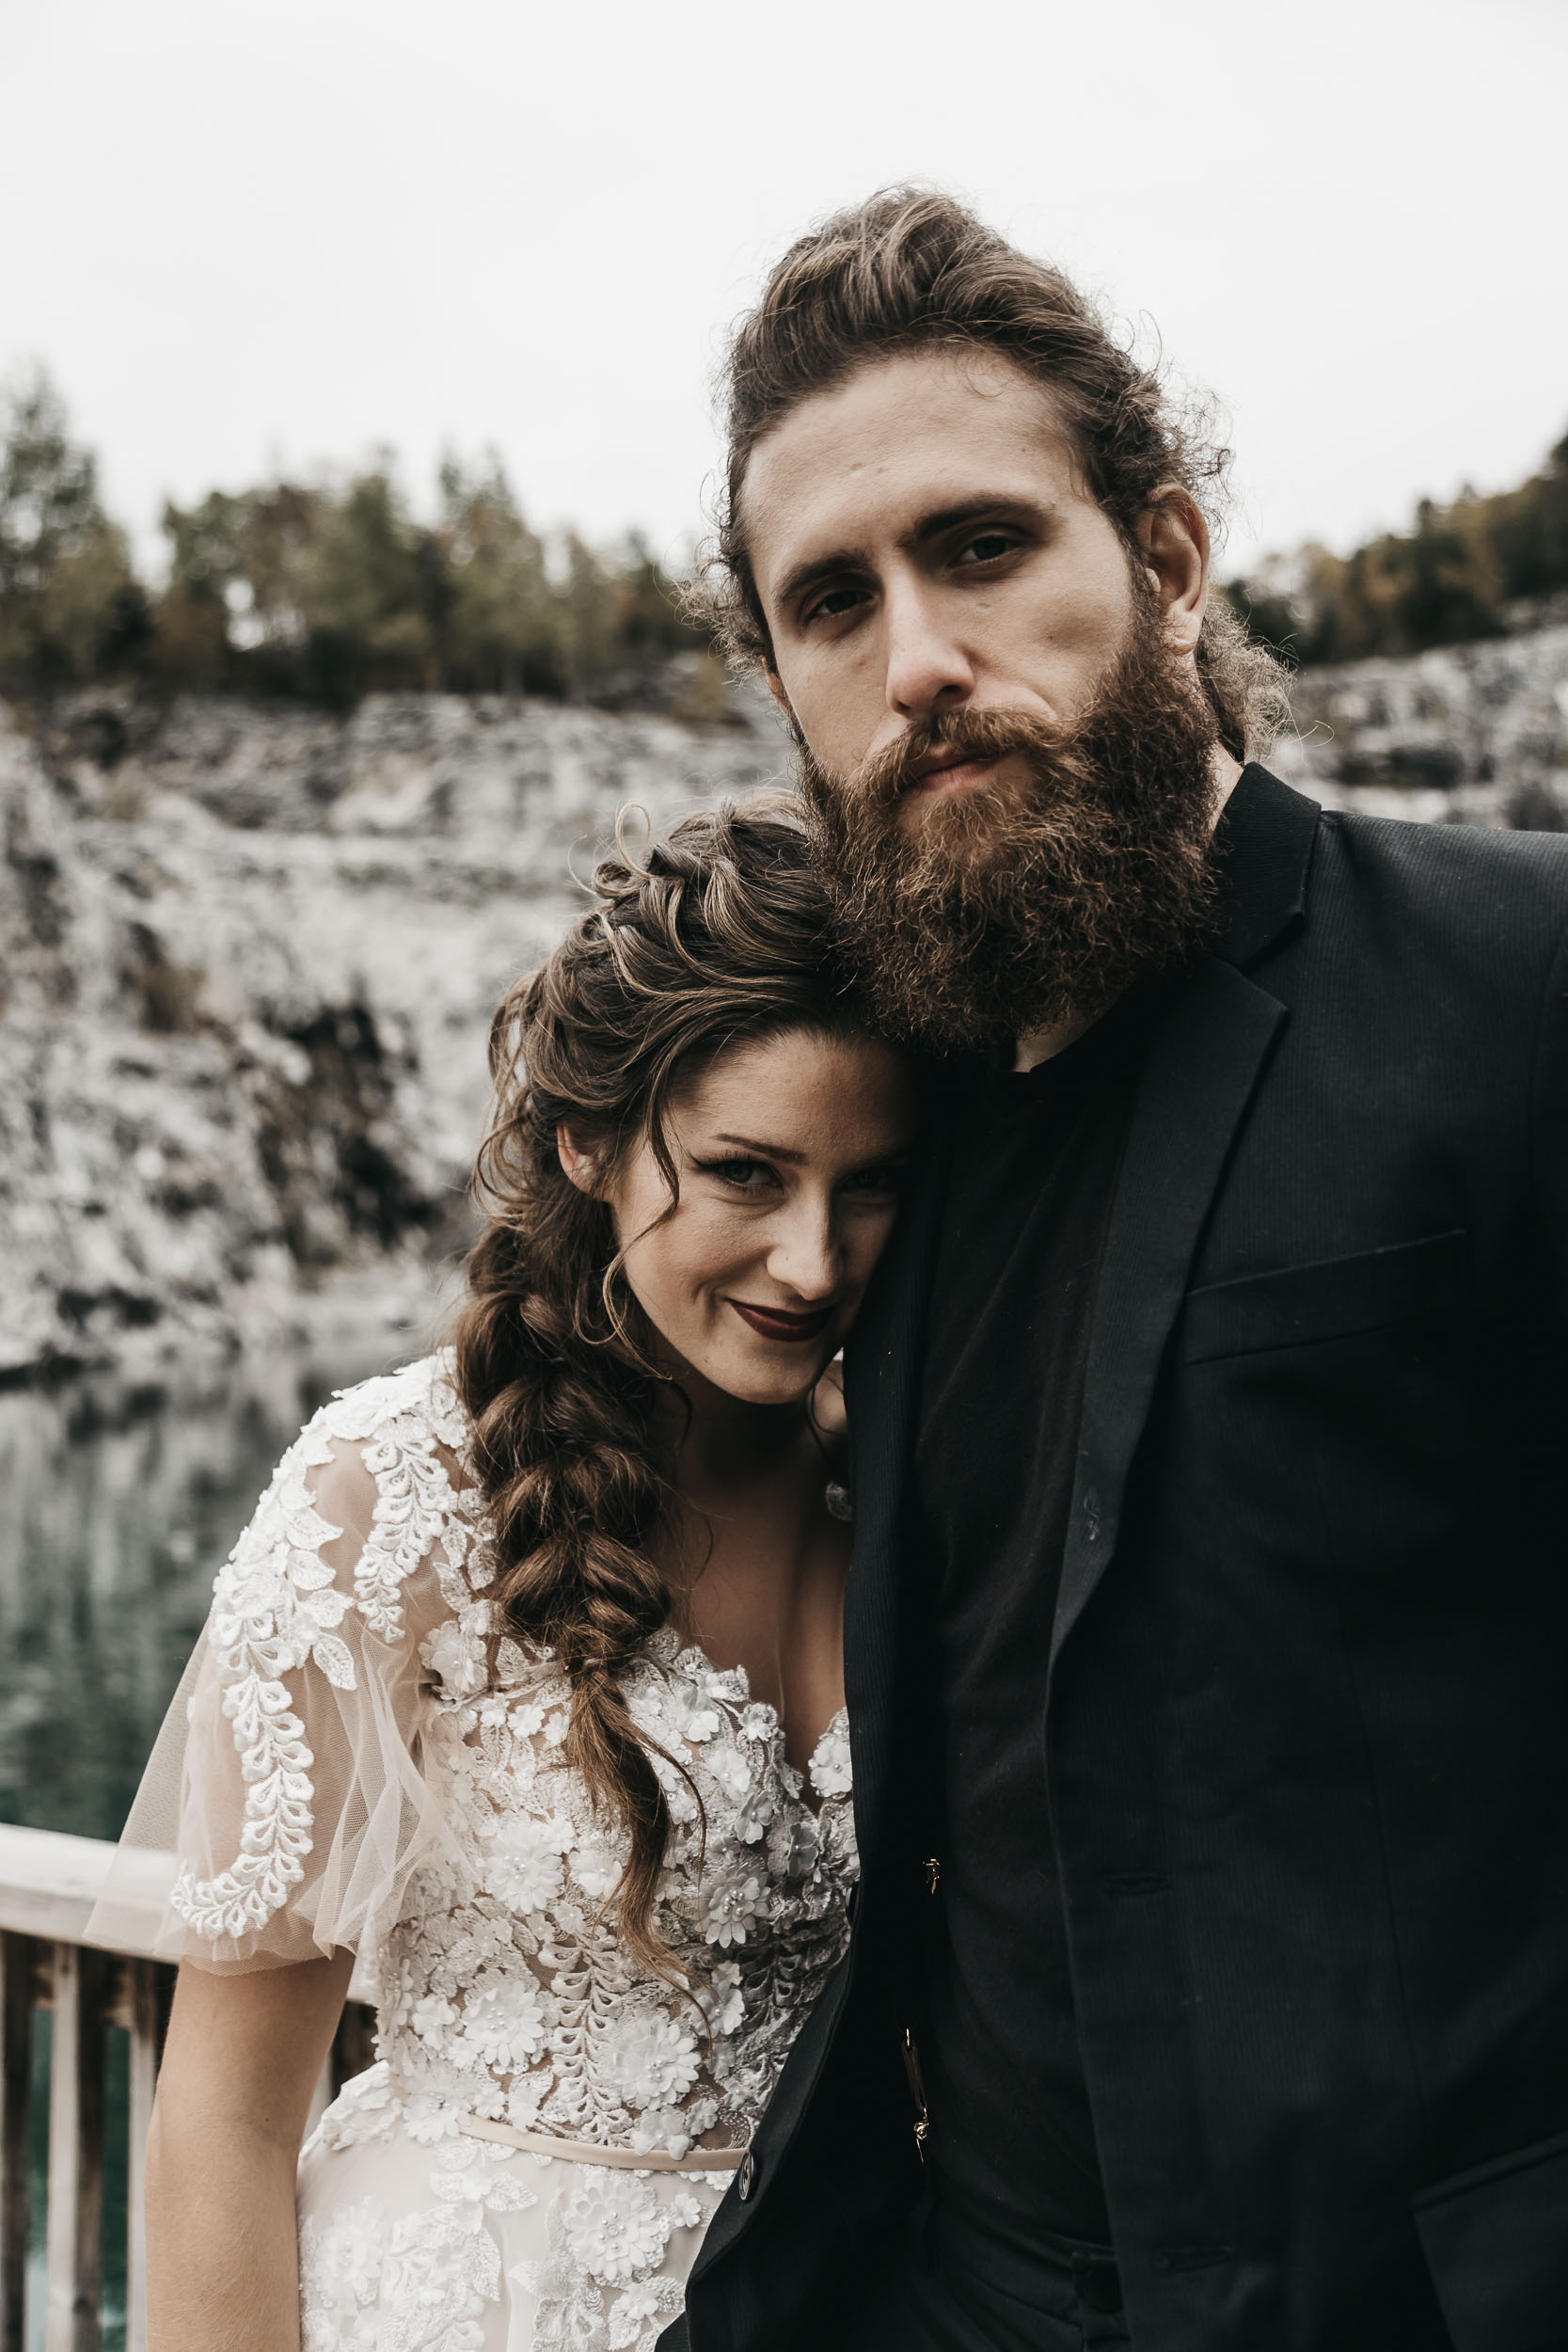 intimate-wedding-elopement-photographer-ottawa-toronto-0208.jpg